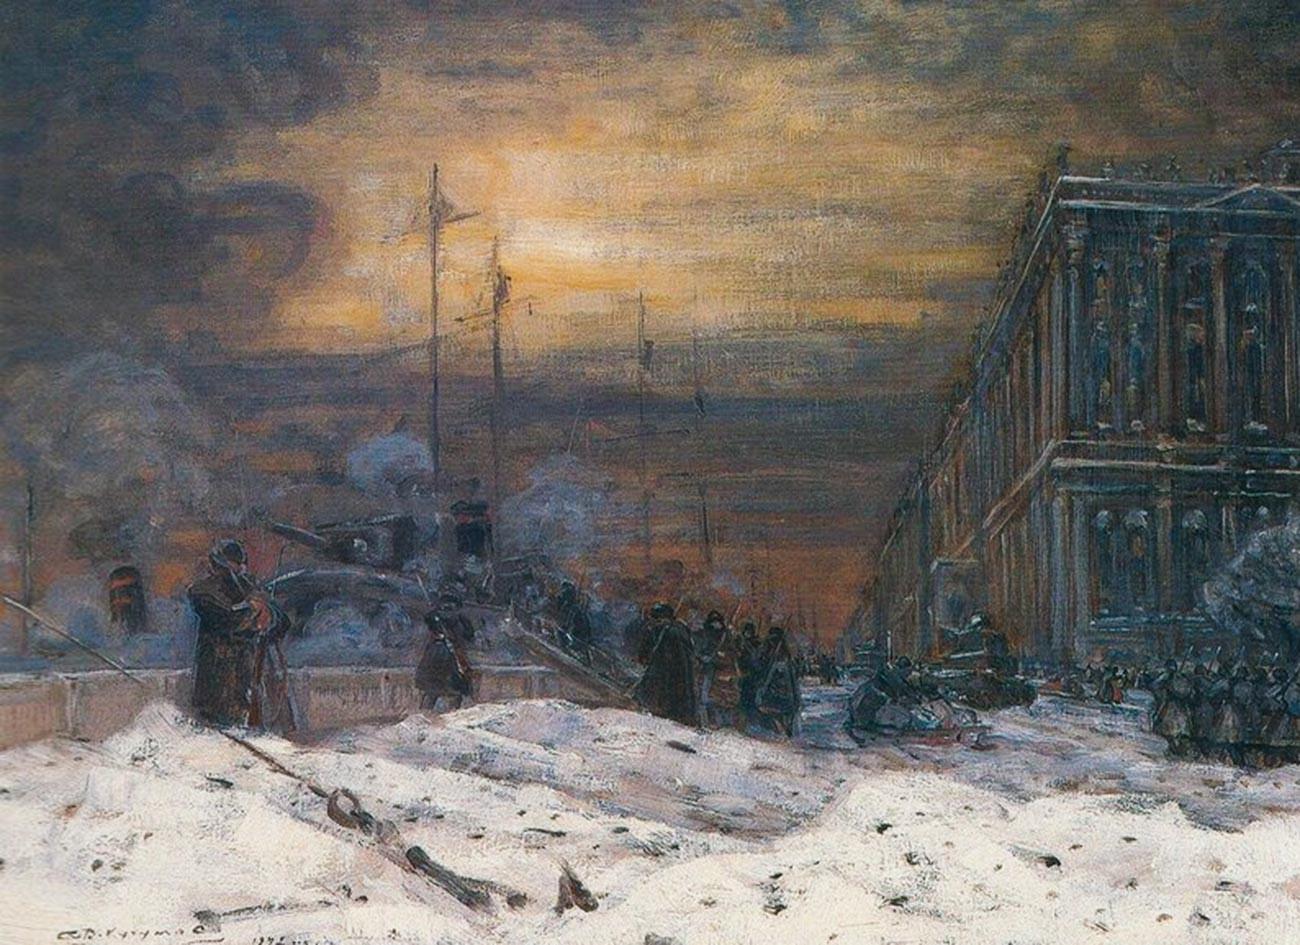 V・クチュモフ、『冬宮付近のネヴァ河岸通り』(1942年)